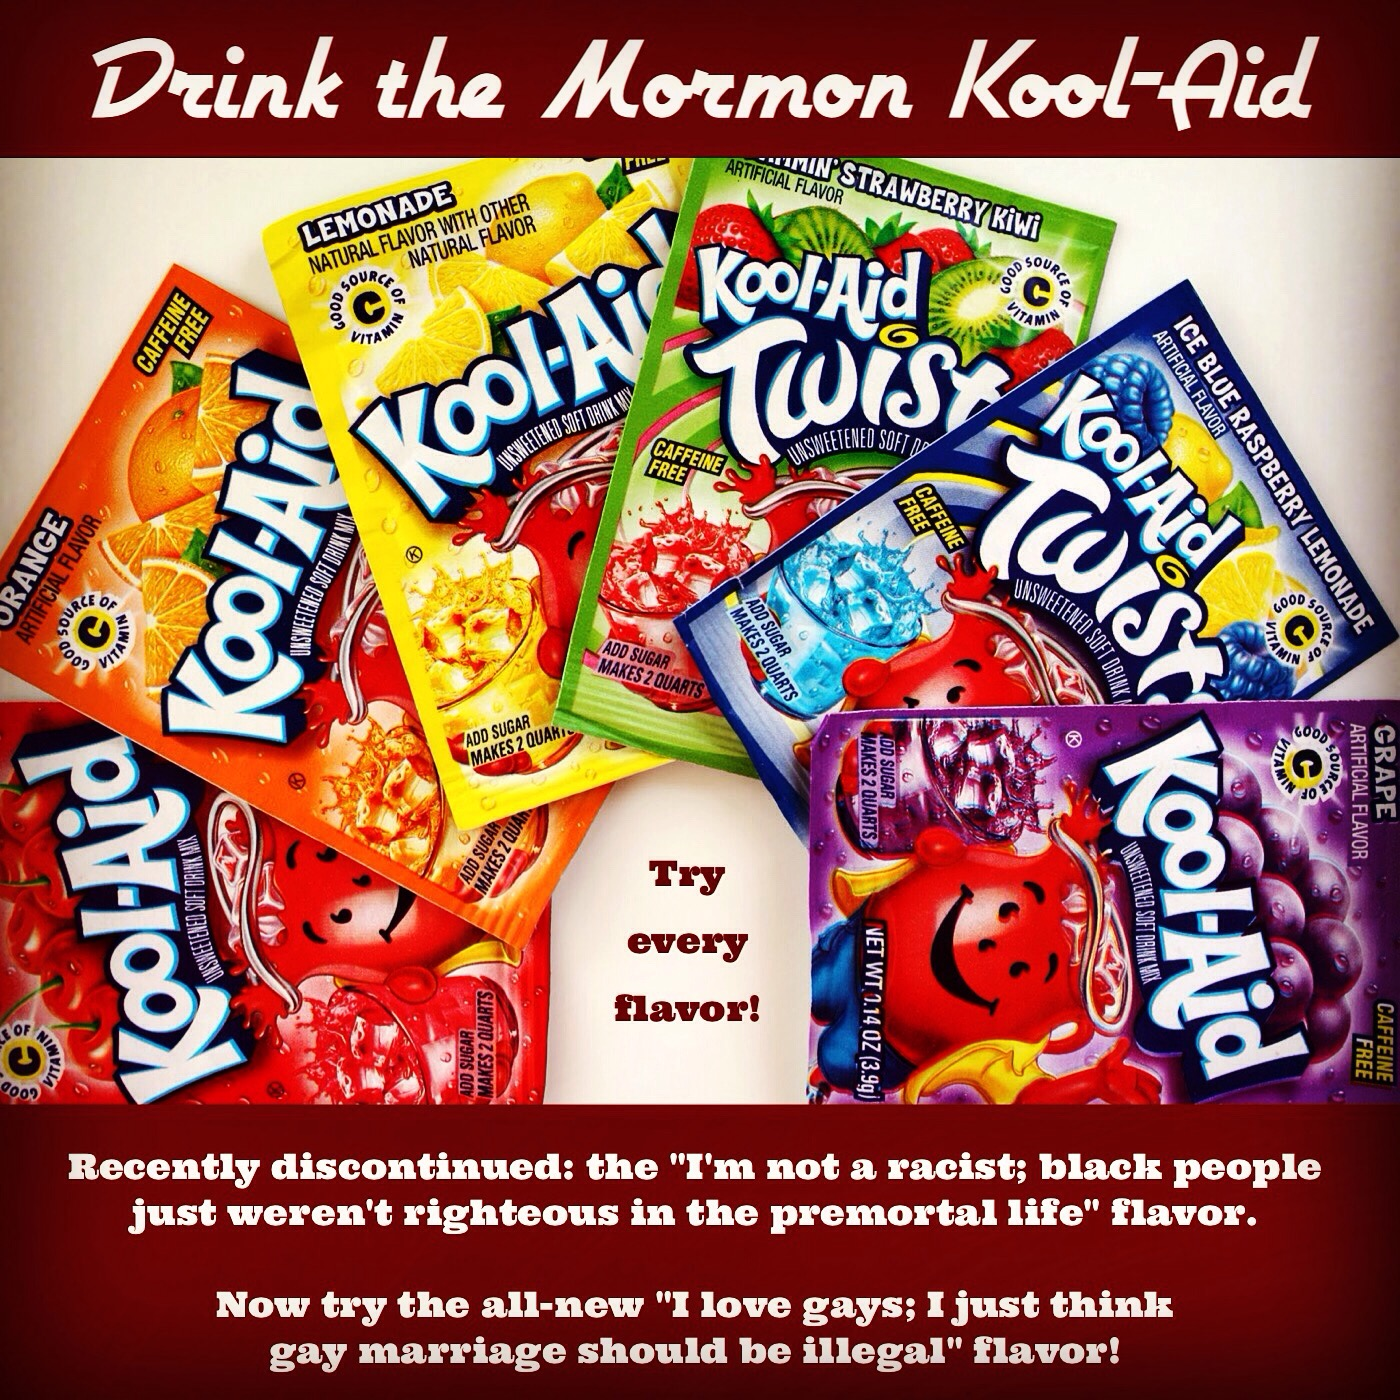 Mormon Kool-Aid